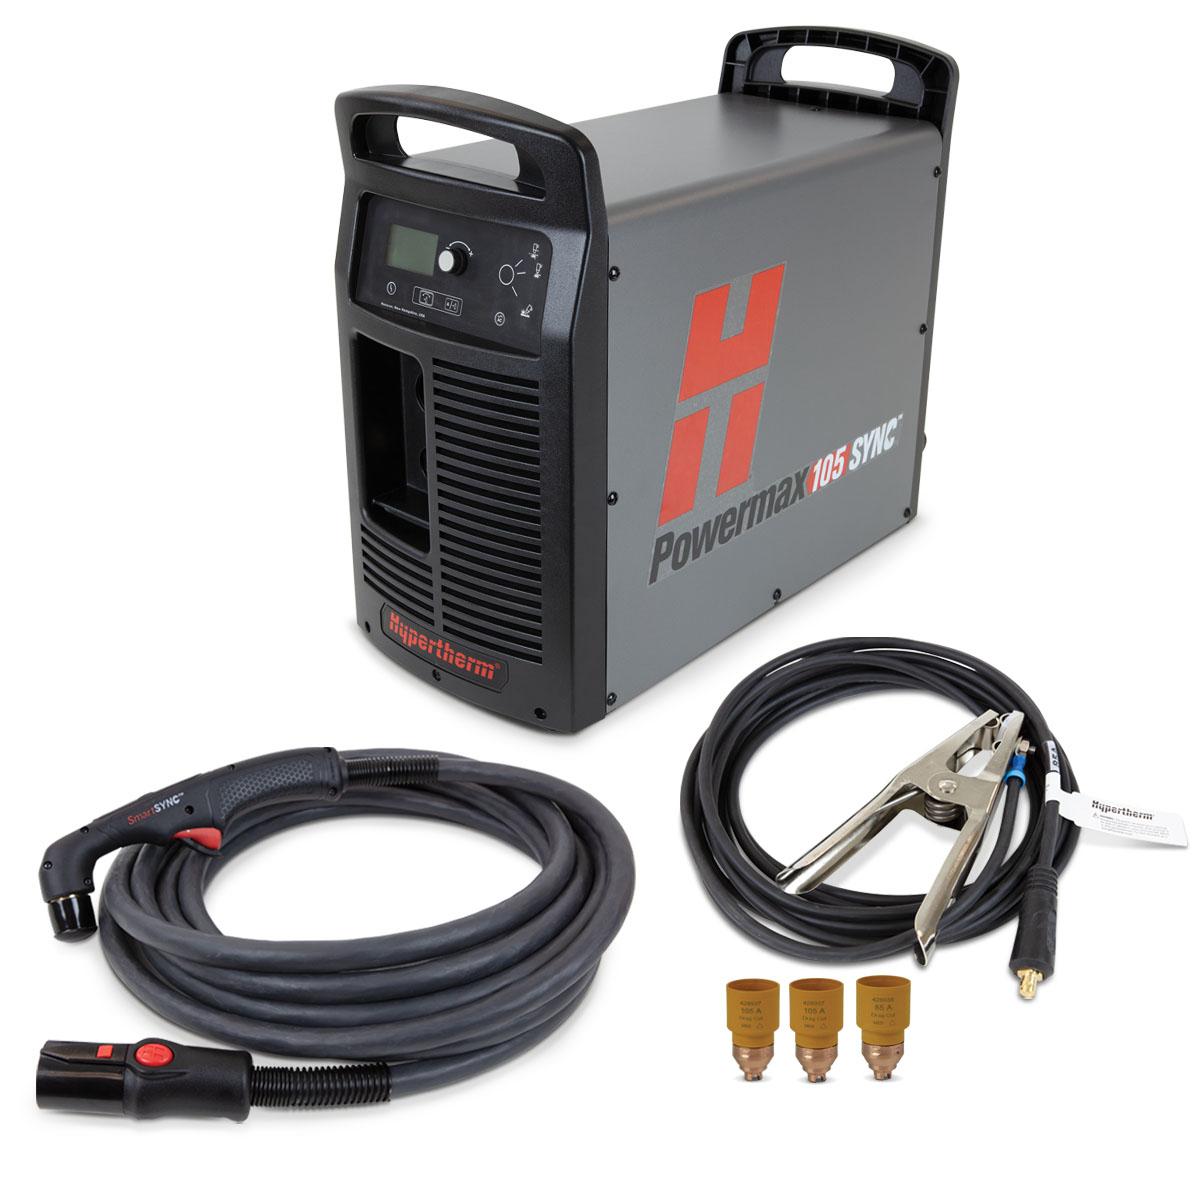 Hypertherm Powermax105 SYNC 415V Package